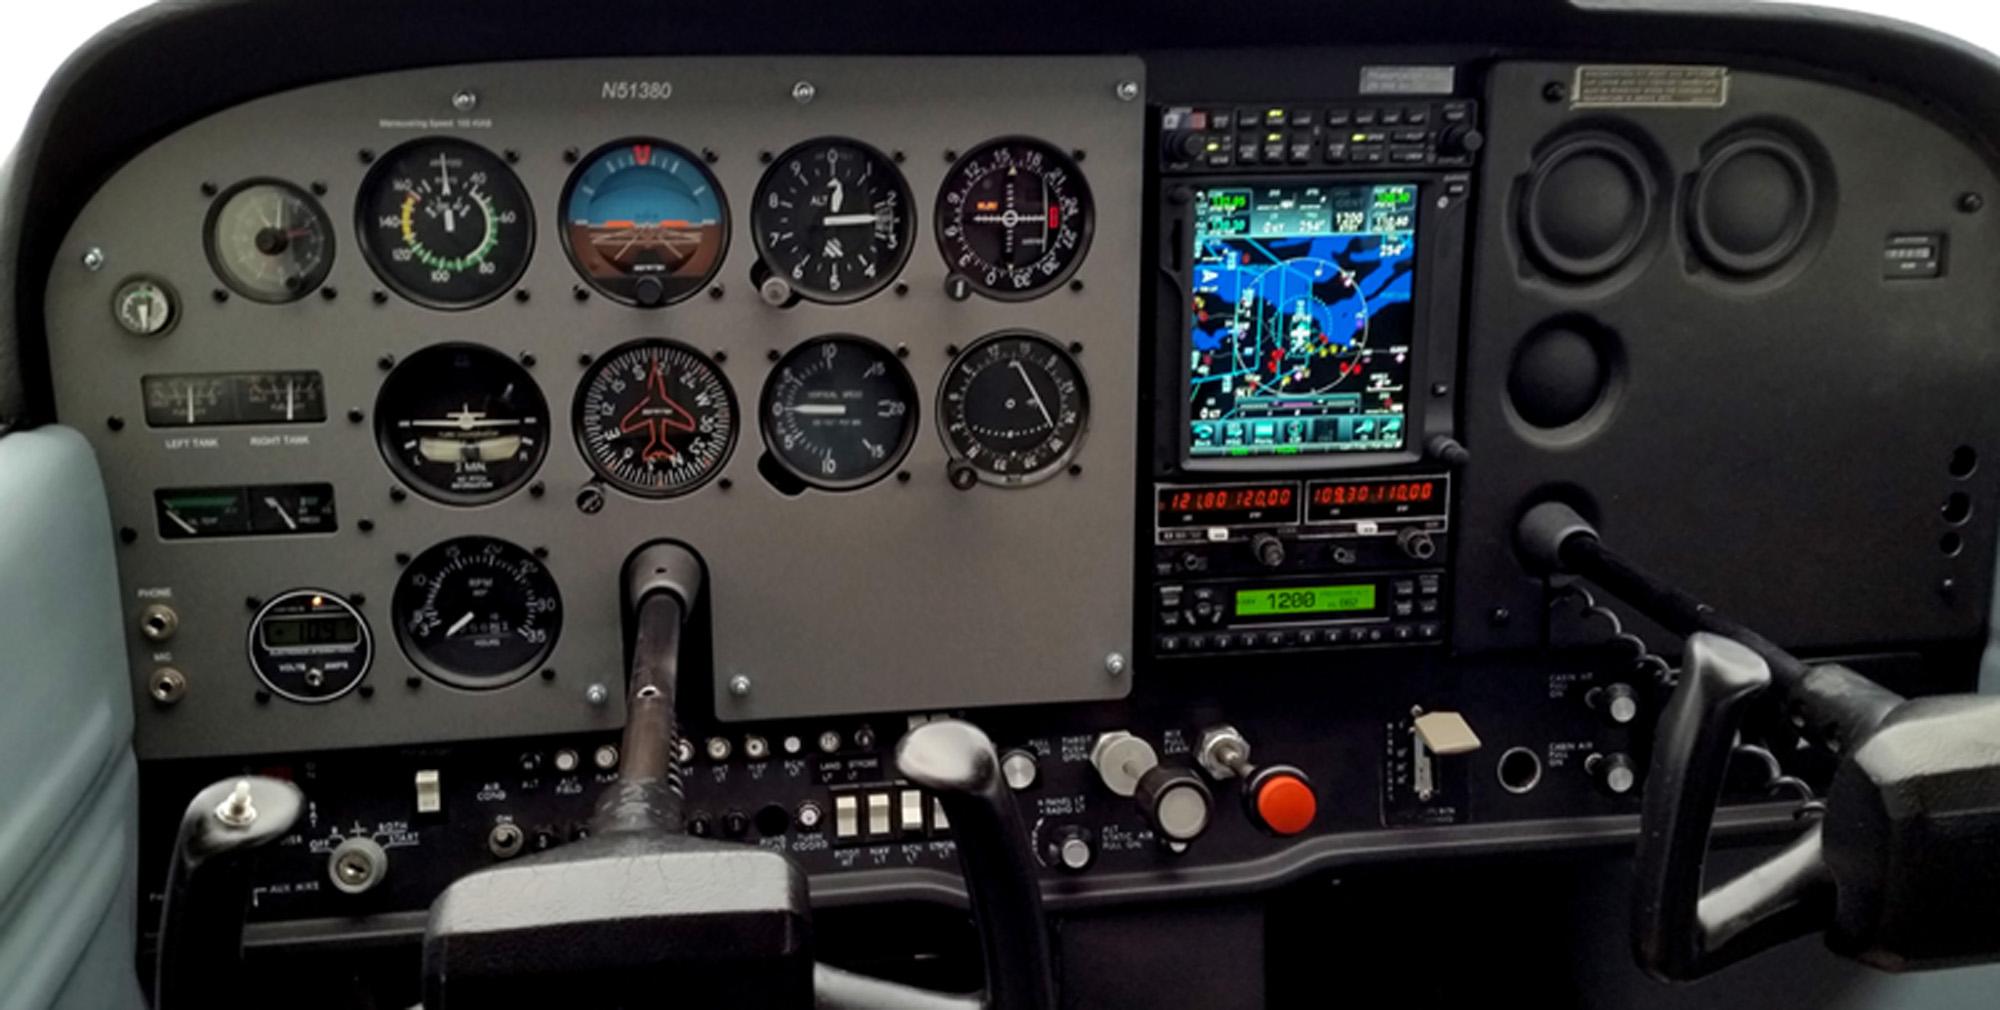 N51380 Cessna 172p 180hp Regal Air